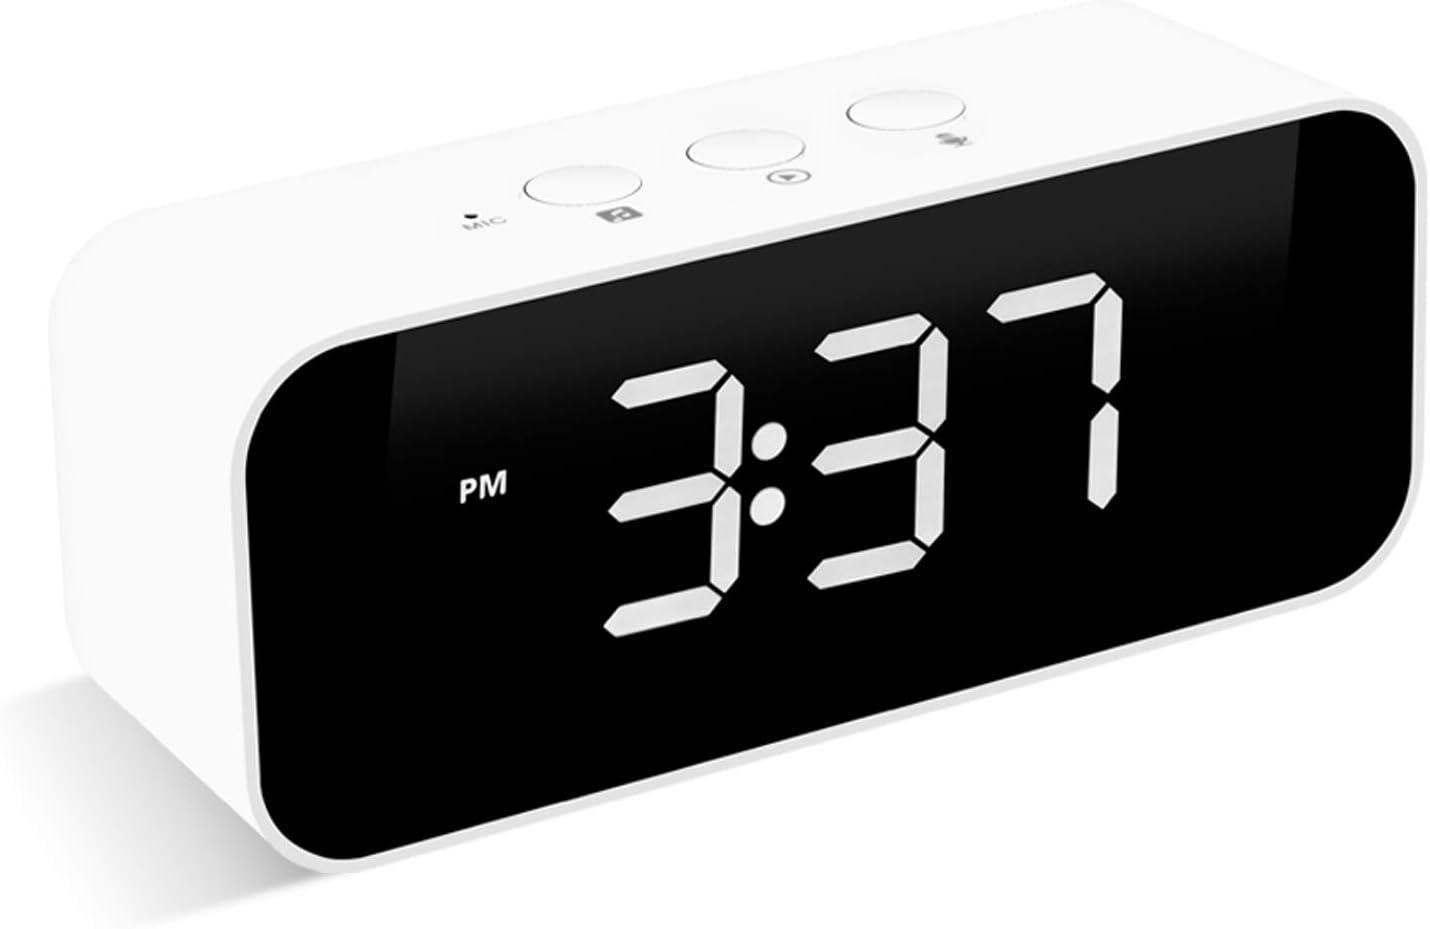 Muerkai Modern Digital Alarm Clock, with USB Port for Charging, Voice Recording, 3 Brightness, 8 Alarm Sounds & 3 Alarm Volume, Snooze Small Led Desk Clock for Kids, Bedroom, Home, Office (White)